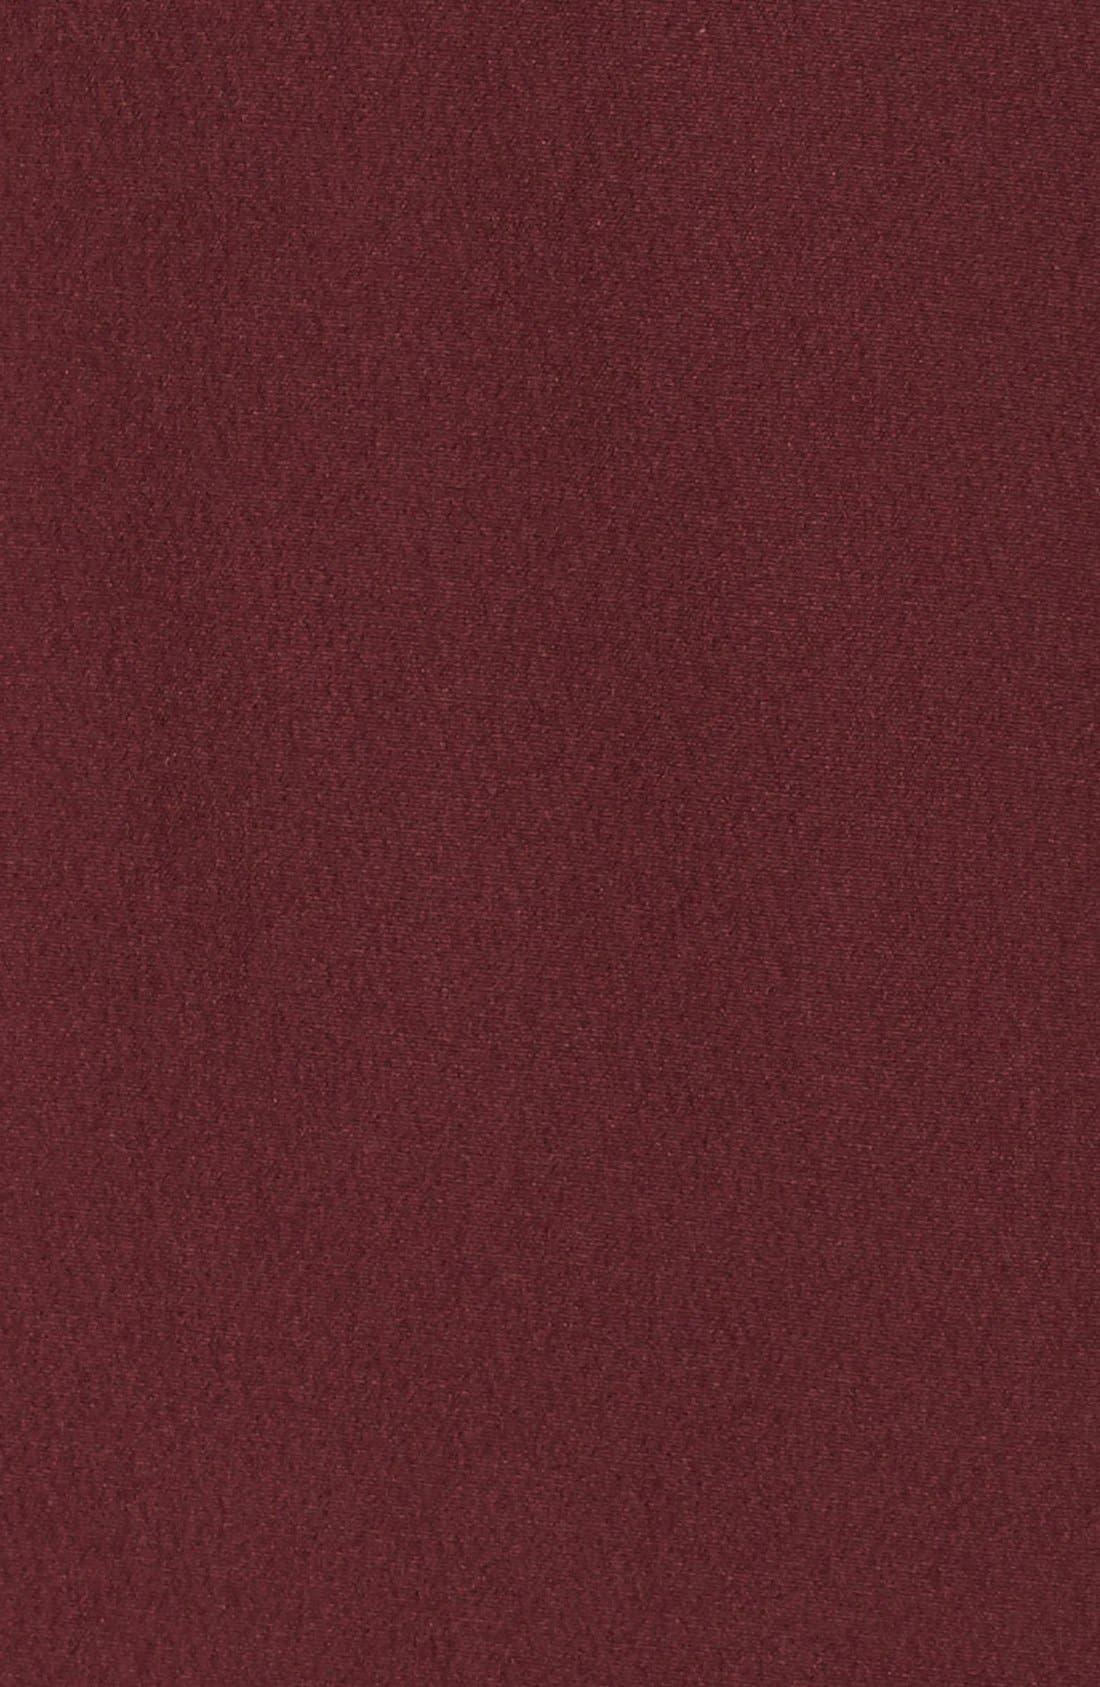 'Shelbe Raschel' Softshell Jacket,                             Alternate thumbnail 6, color,                             Deep Garnet Red